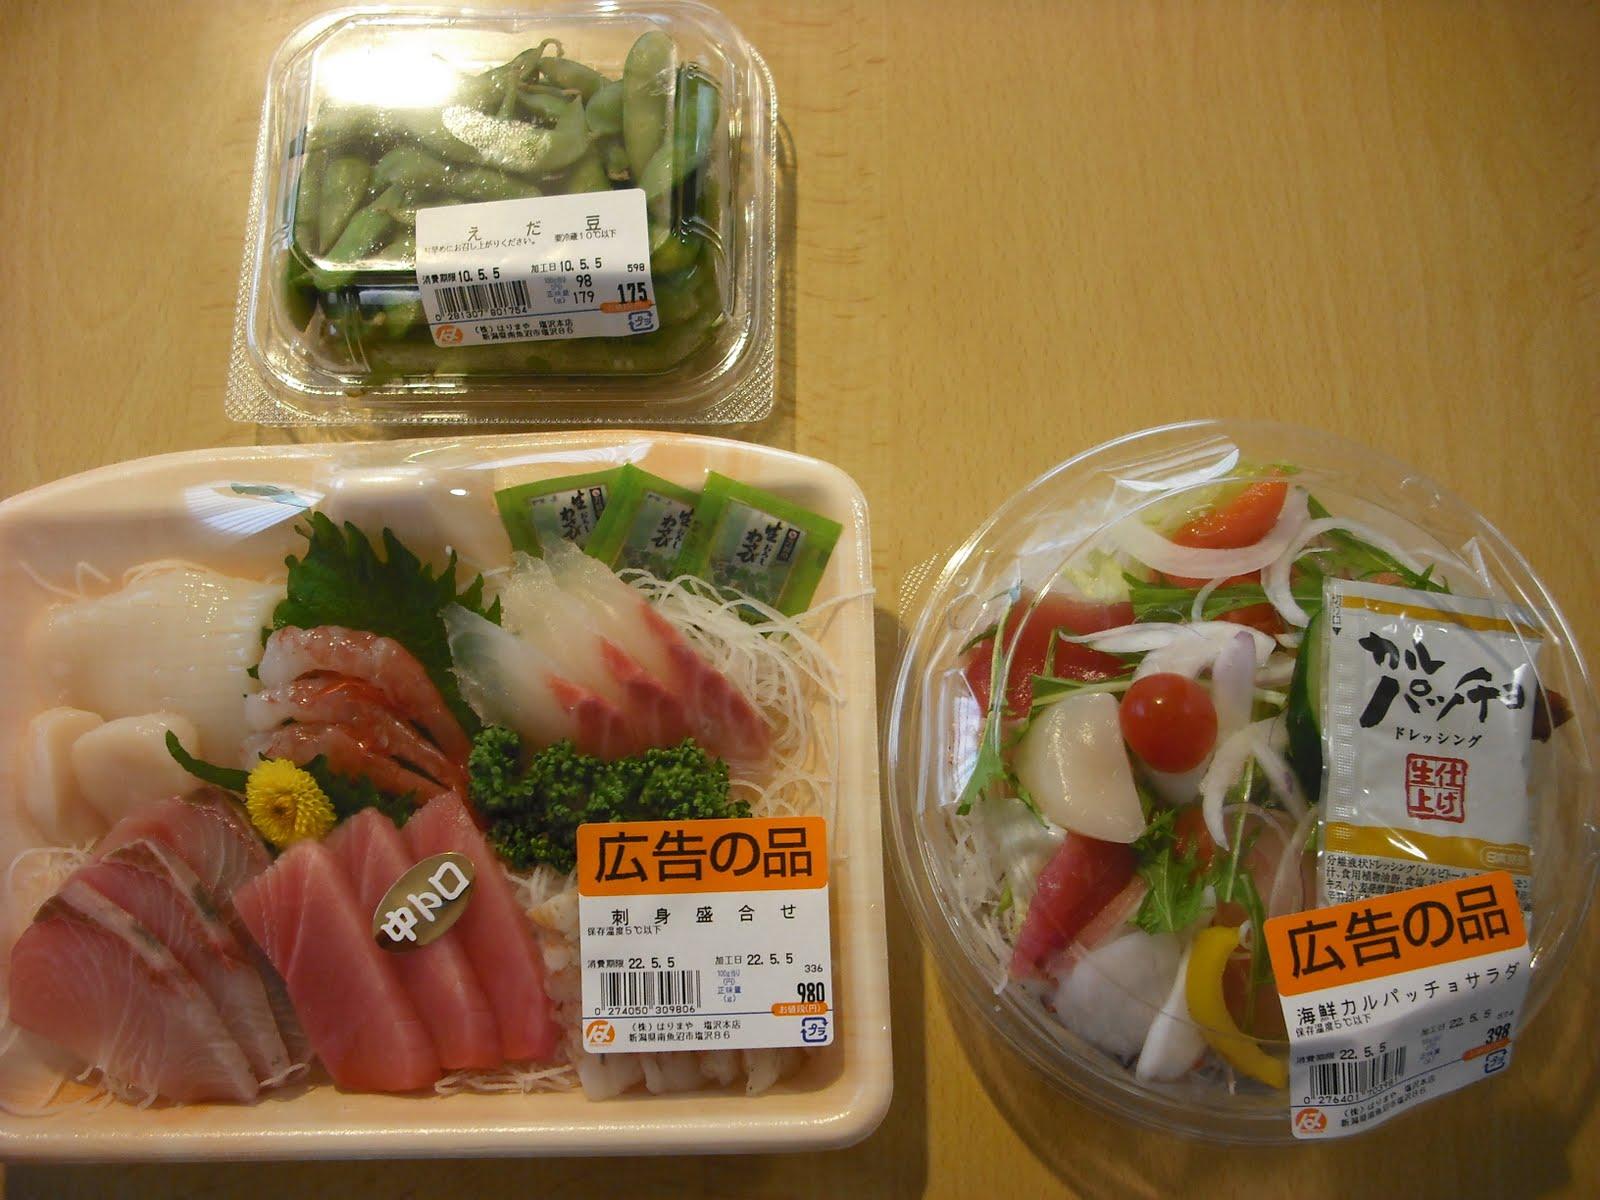 hiroyuki s blog on japanese cooking sashimi and beer 刺身とビール